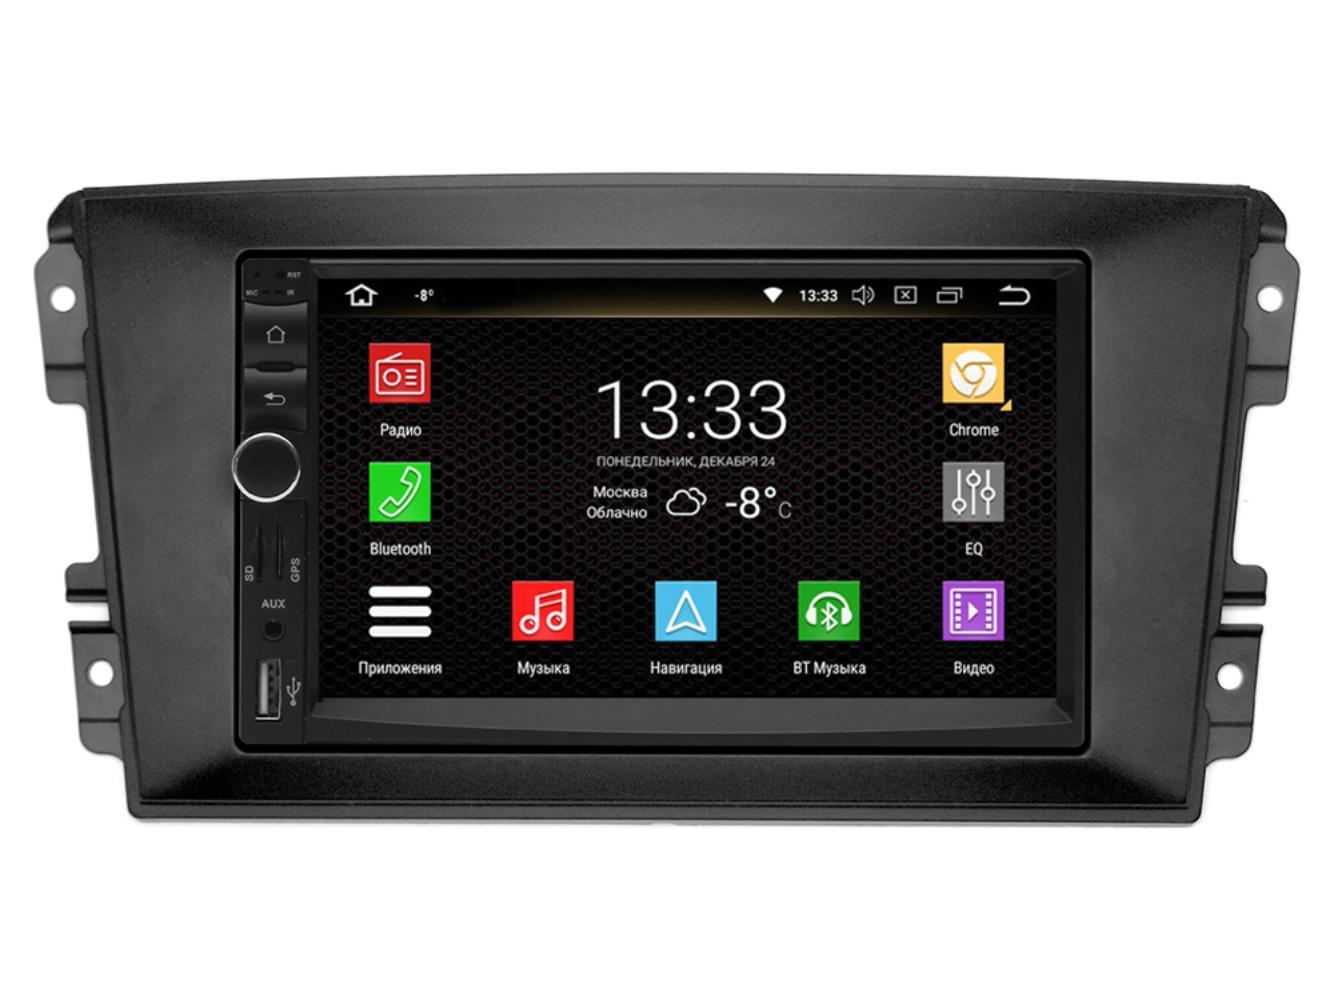 Автомагнитола NaviPilot DROID9L для Datsun on-DO, mi-DO 2015 - н.в. (+ Камера заднего вида в подарок!)